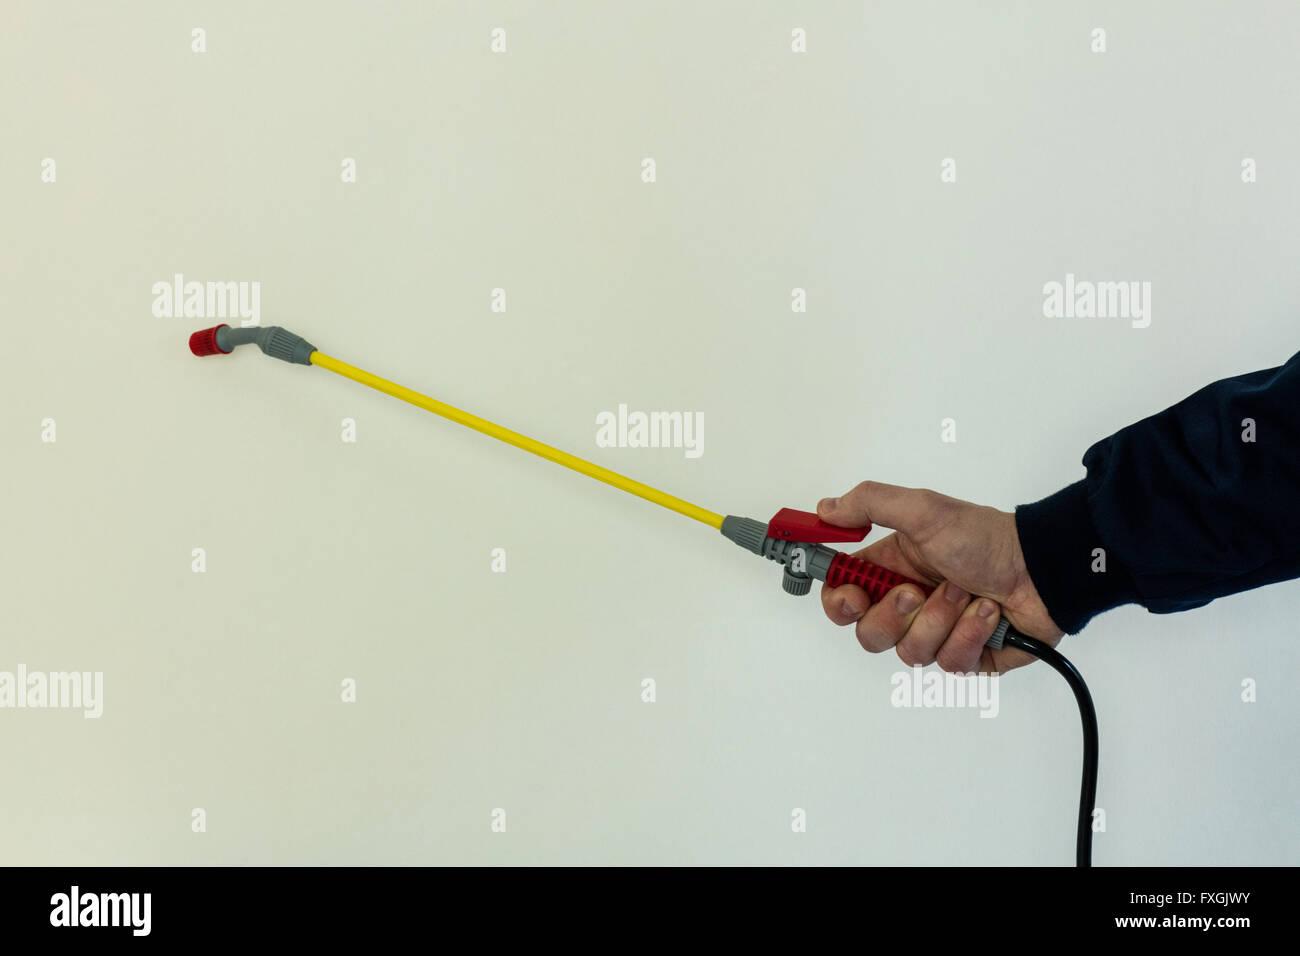 Mans hand spraying pesticide - Stock Image